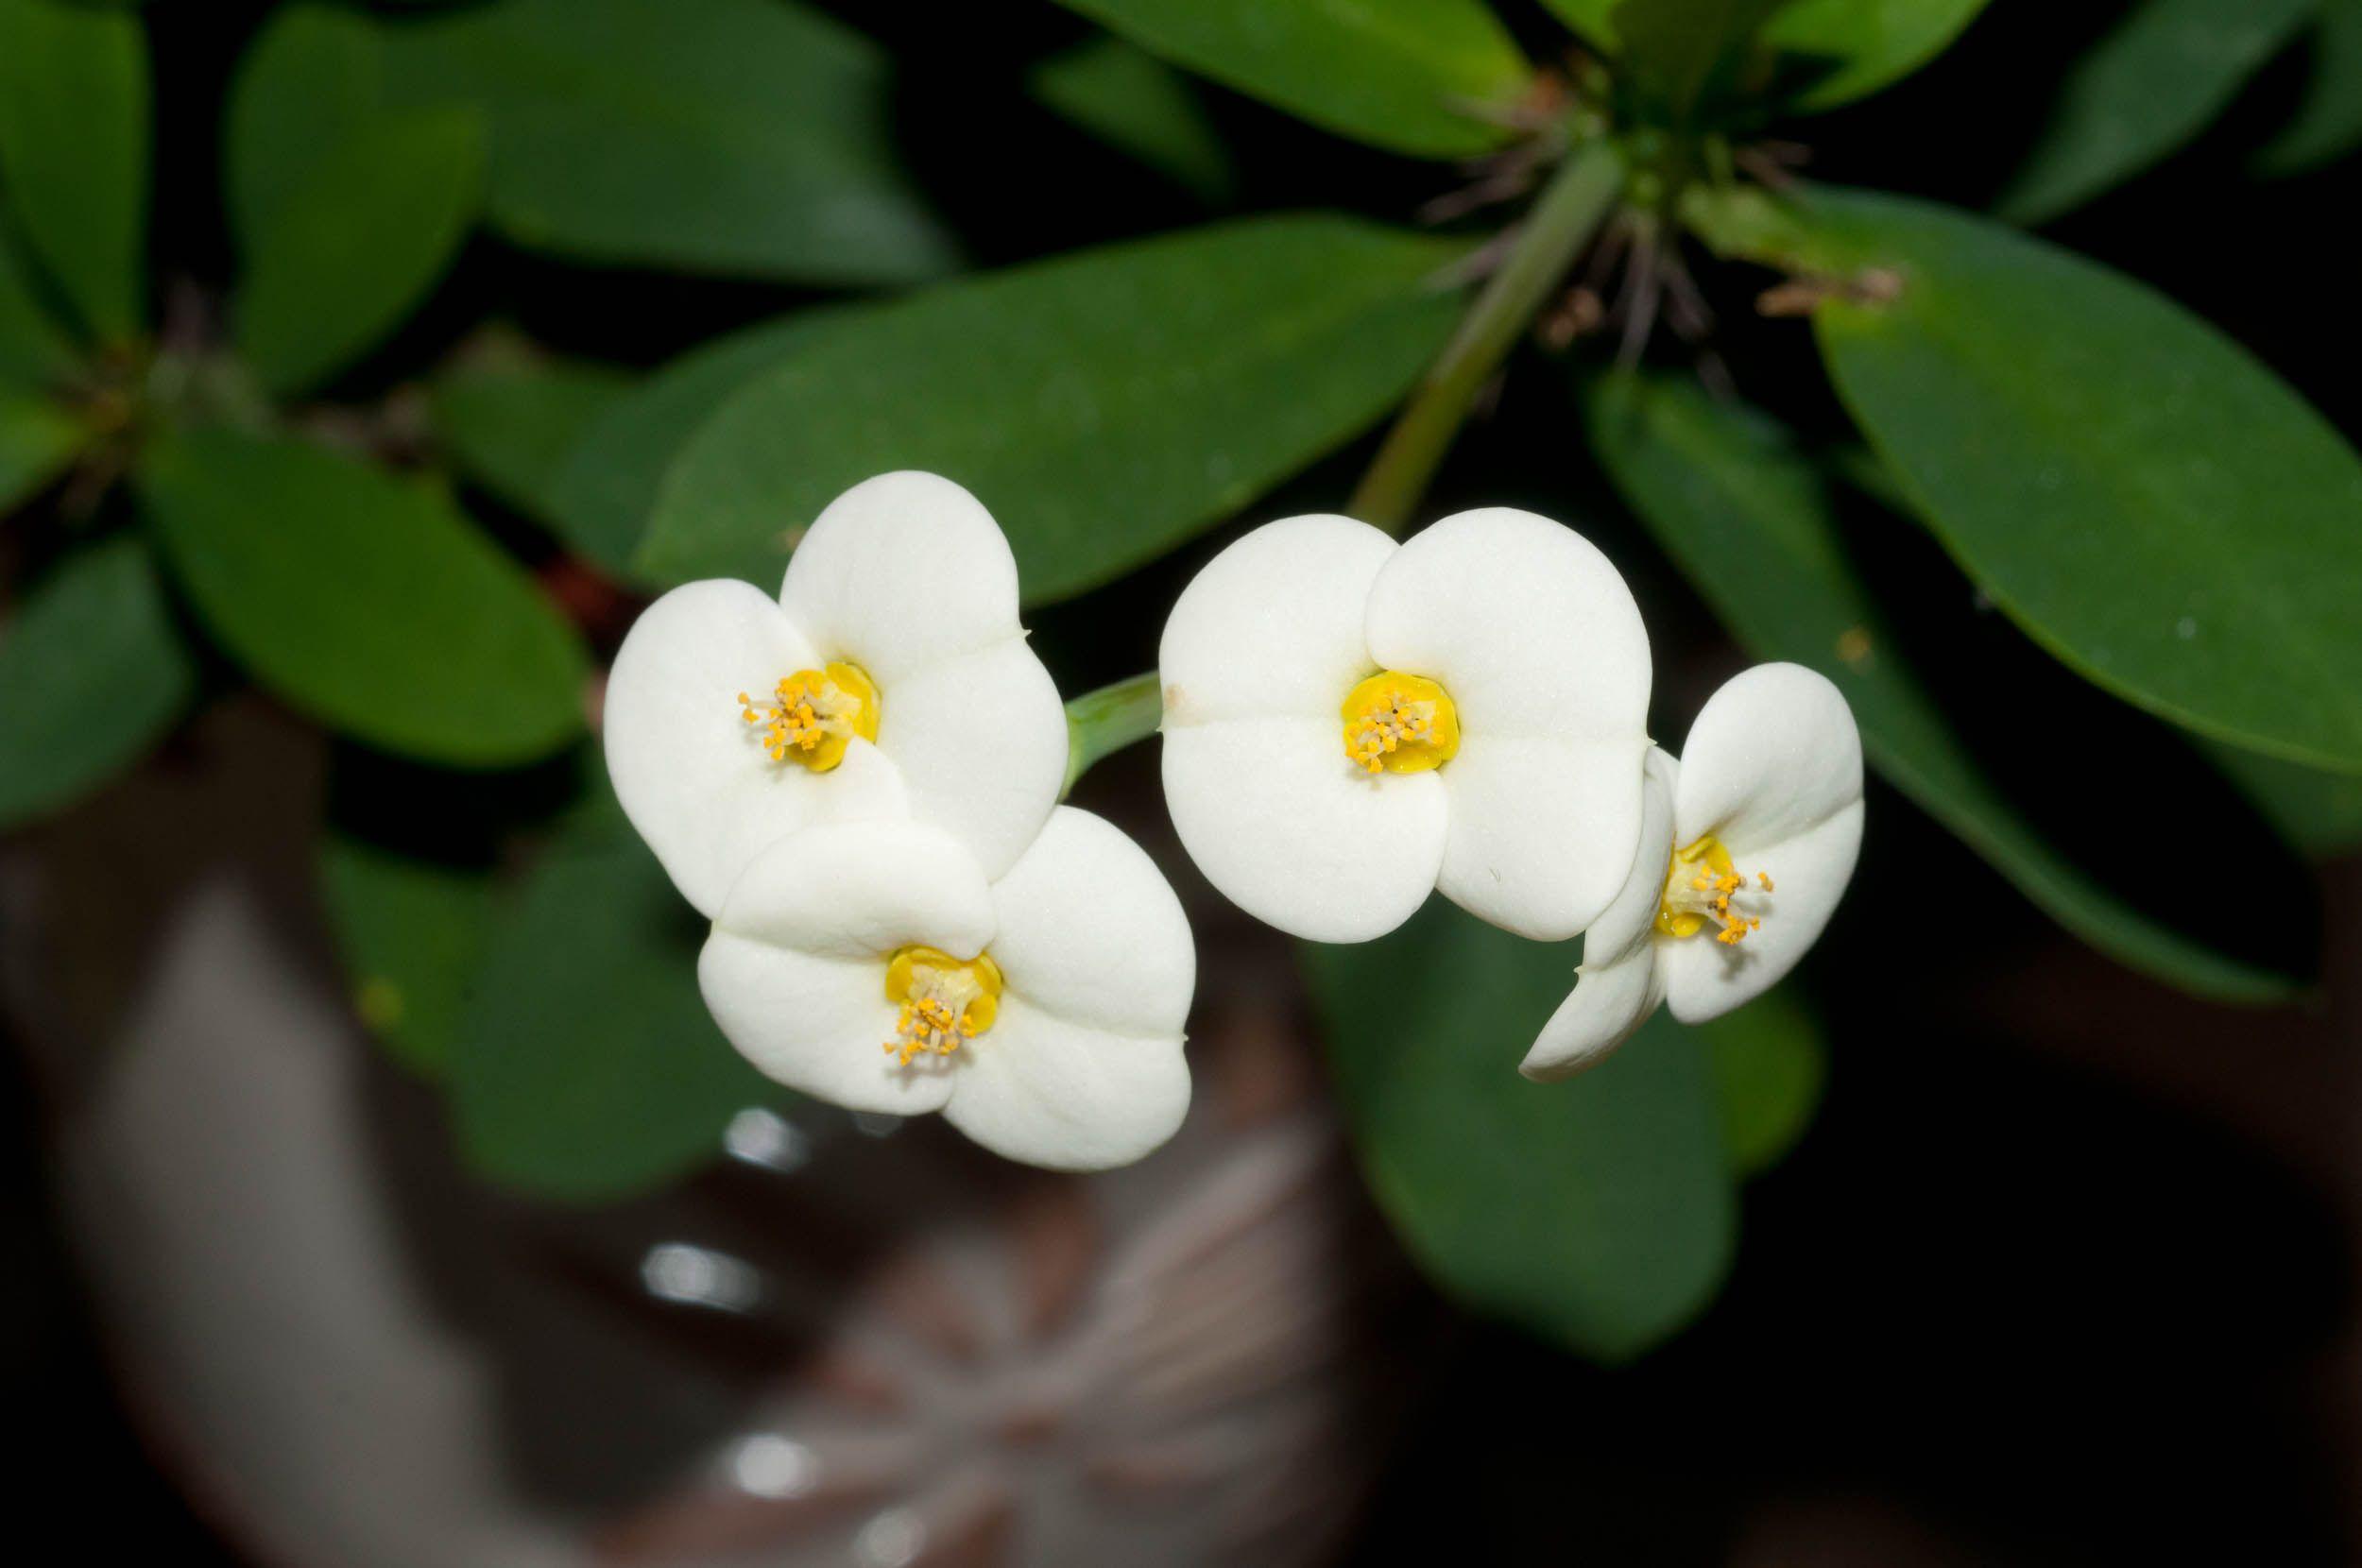 Euphorbiamiliilutea 1d43b09305g 25001660 White Flowers